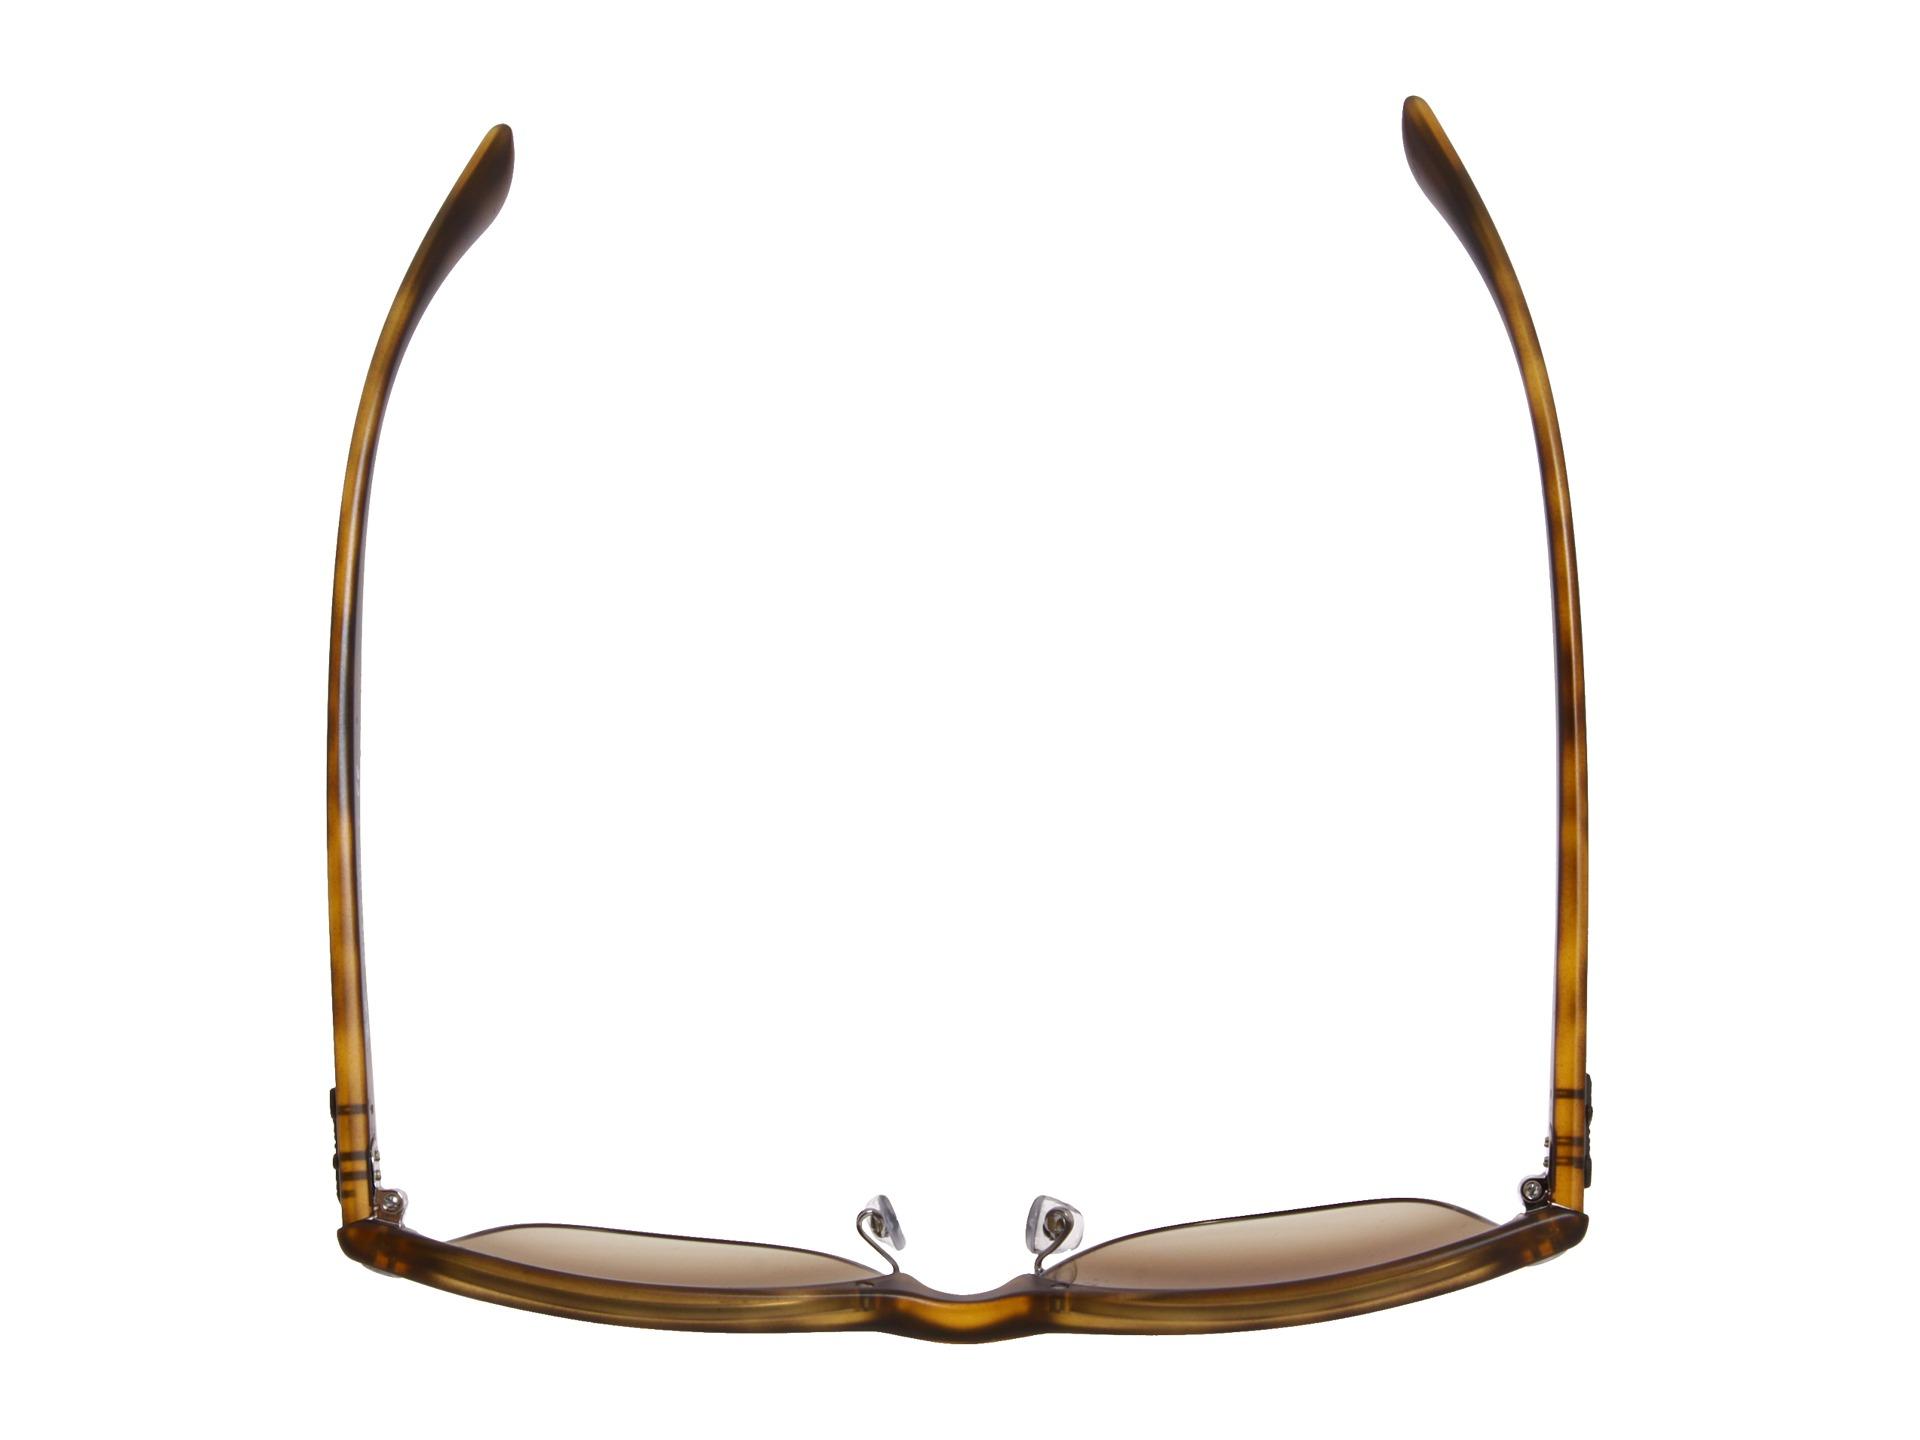 abb7950b08c Cheap Oakley Sunglasses Coupon Code 2014